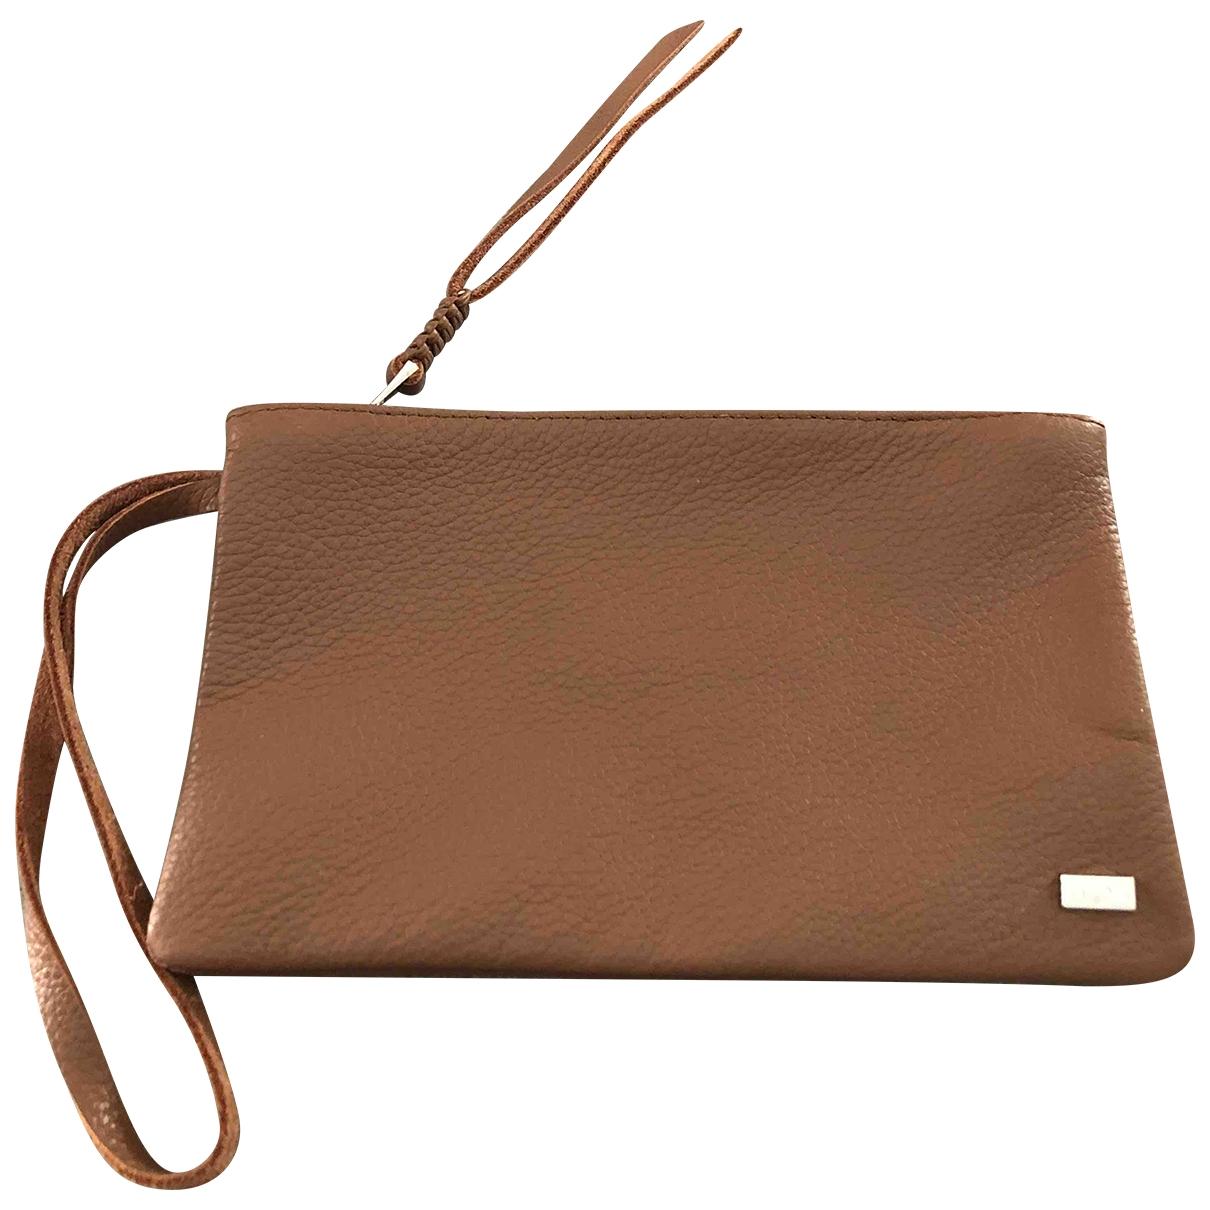 Callista Crafts \N Camel Leather Clutch bag for Women \N